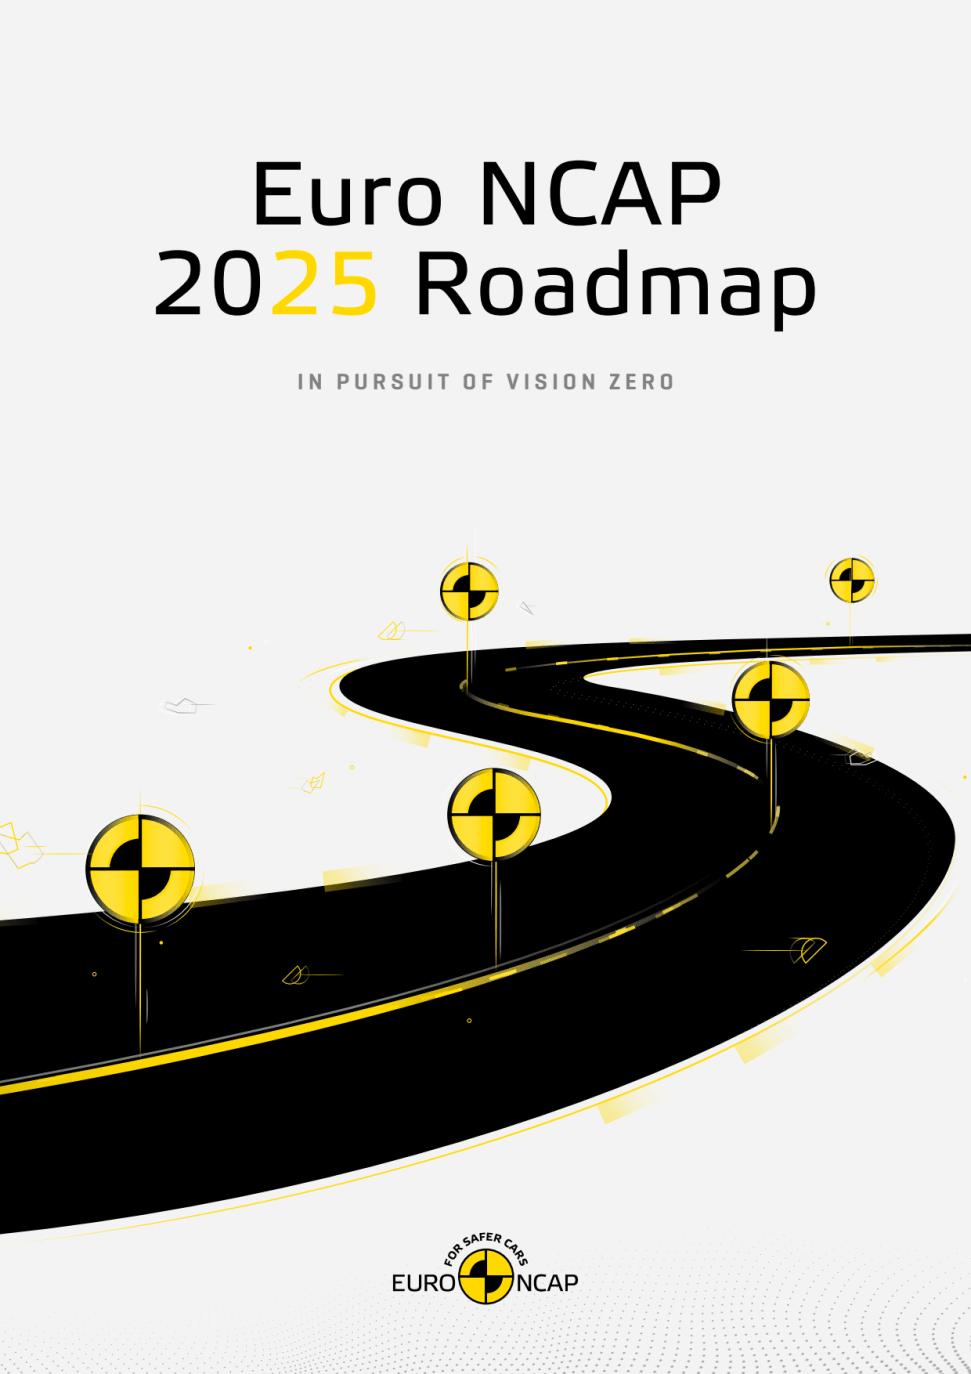 euro ncap road map 2025 thatcham research euro ncap road map 2025 thatcham research